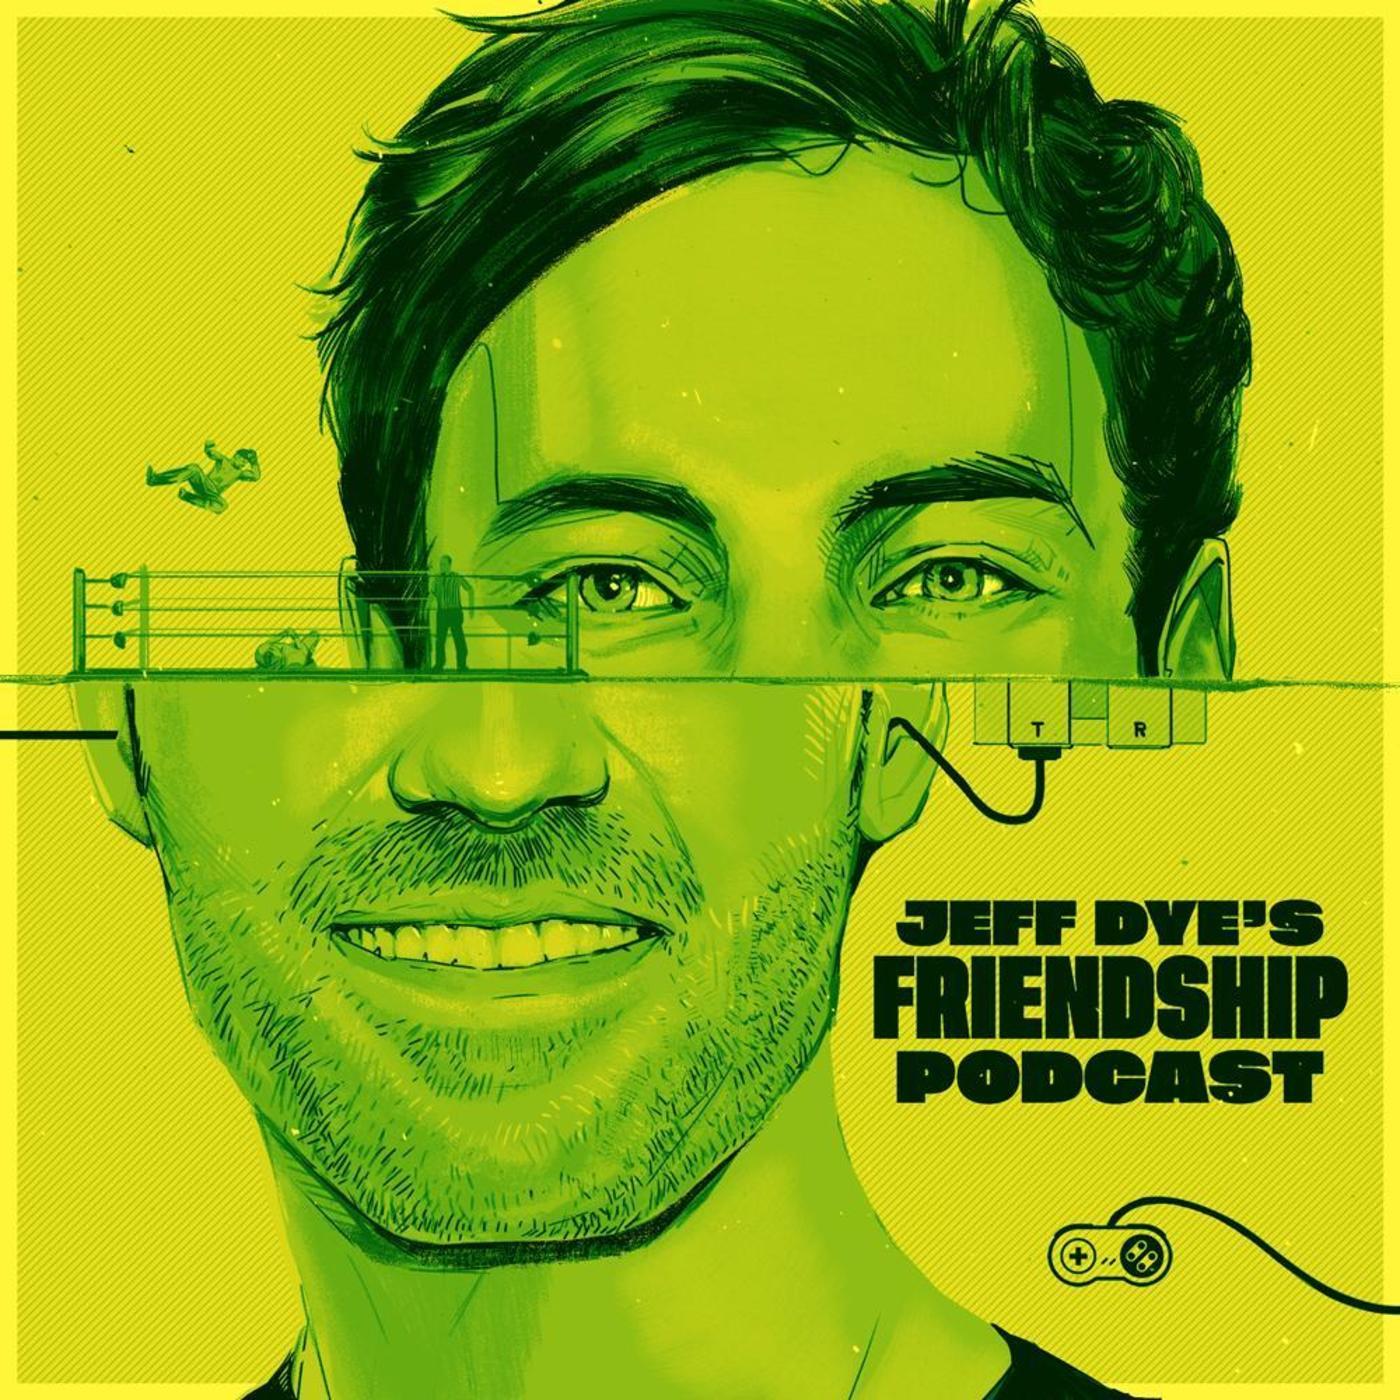 53 - Jeff Dye's Friendship - Tony's Favorite Moments #1